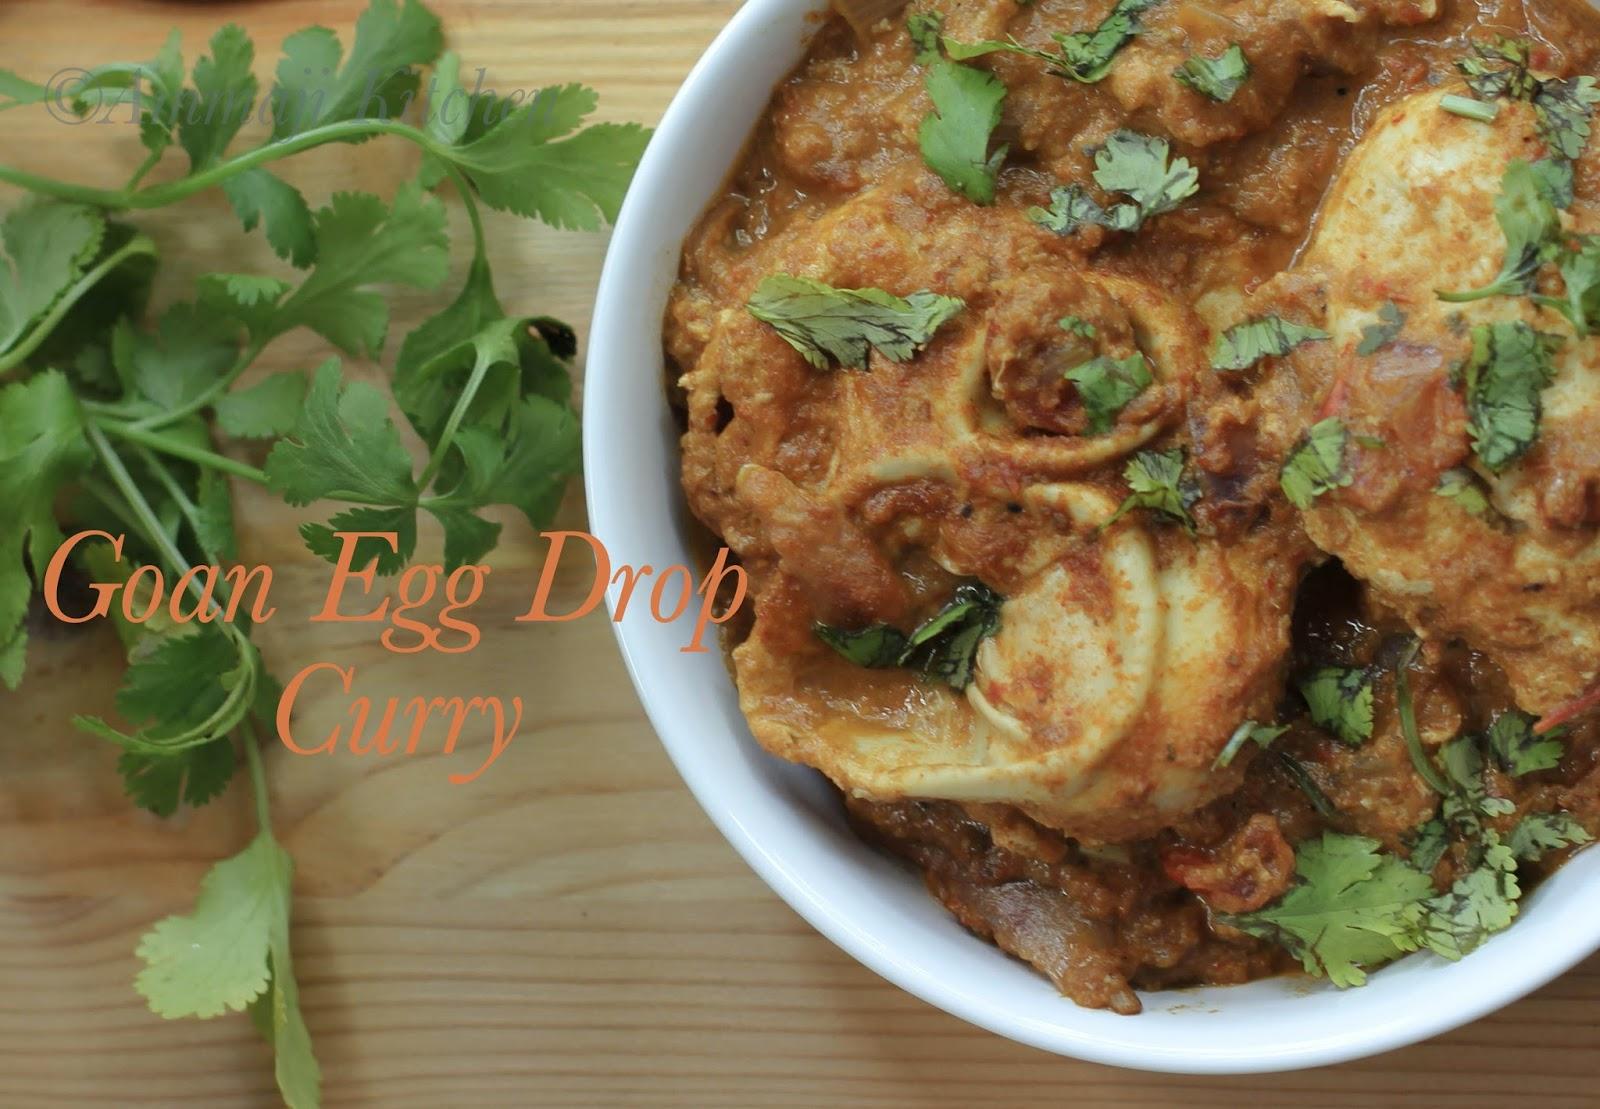 Goan egg drop curry indian food recipes ammaji kitchen goan egg drop curry forumfinder Gallery